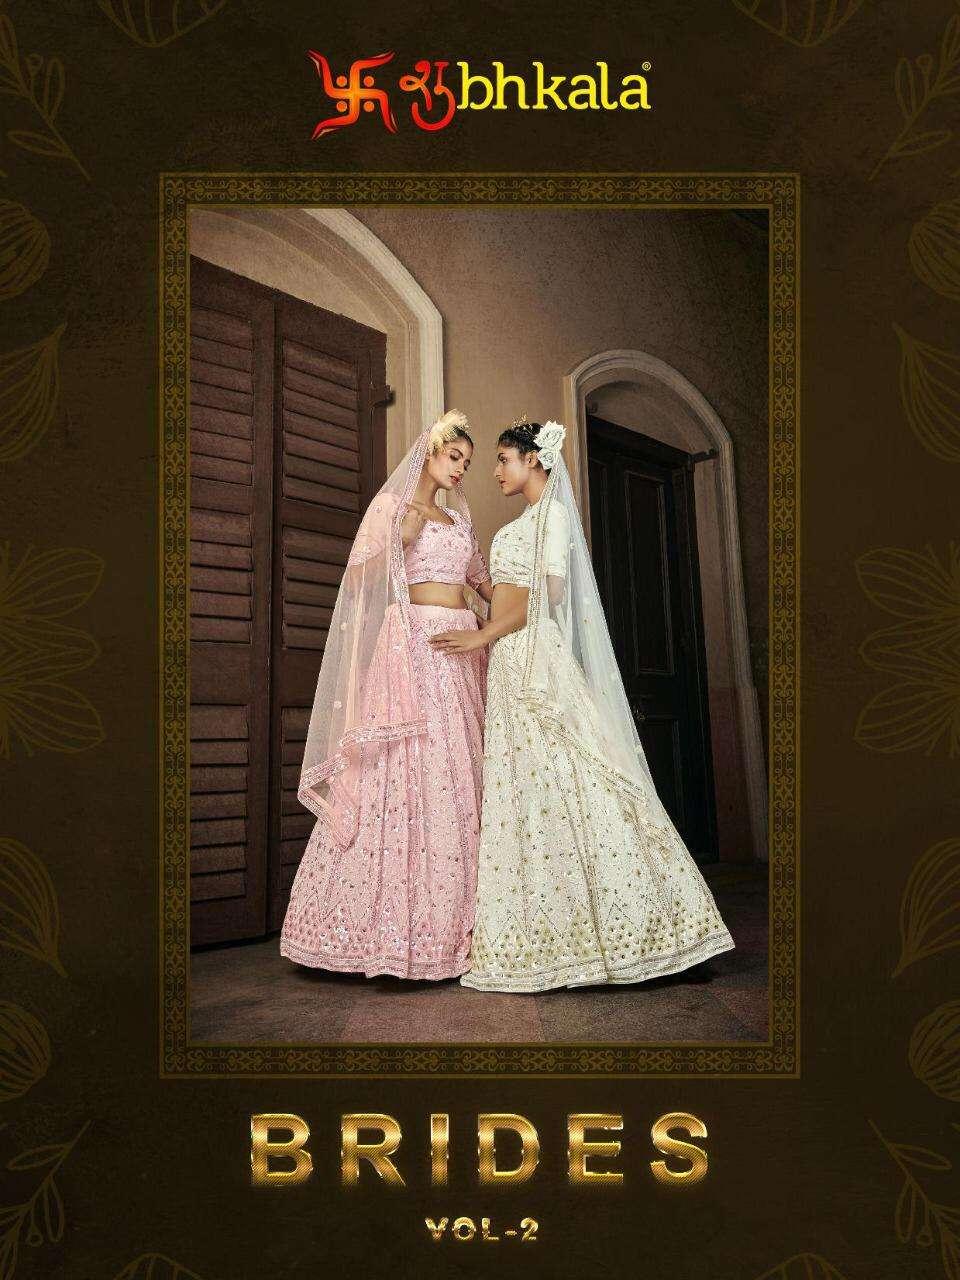 Shubhkala Brides Vol 2 Designer Lehenga Choli New Catalog Supplier